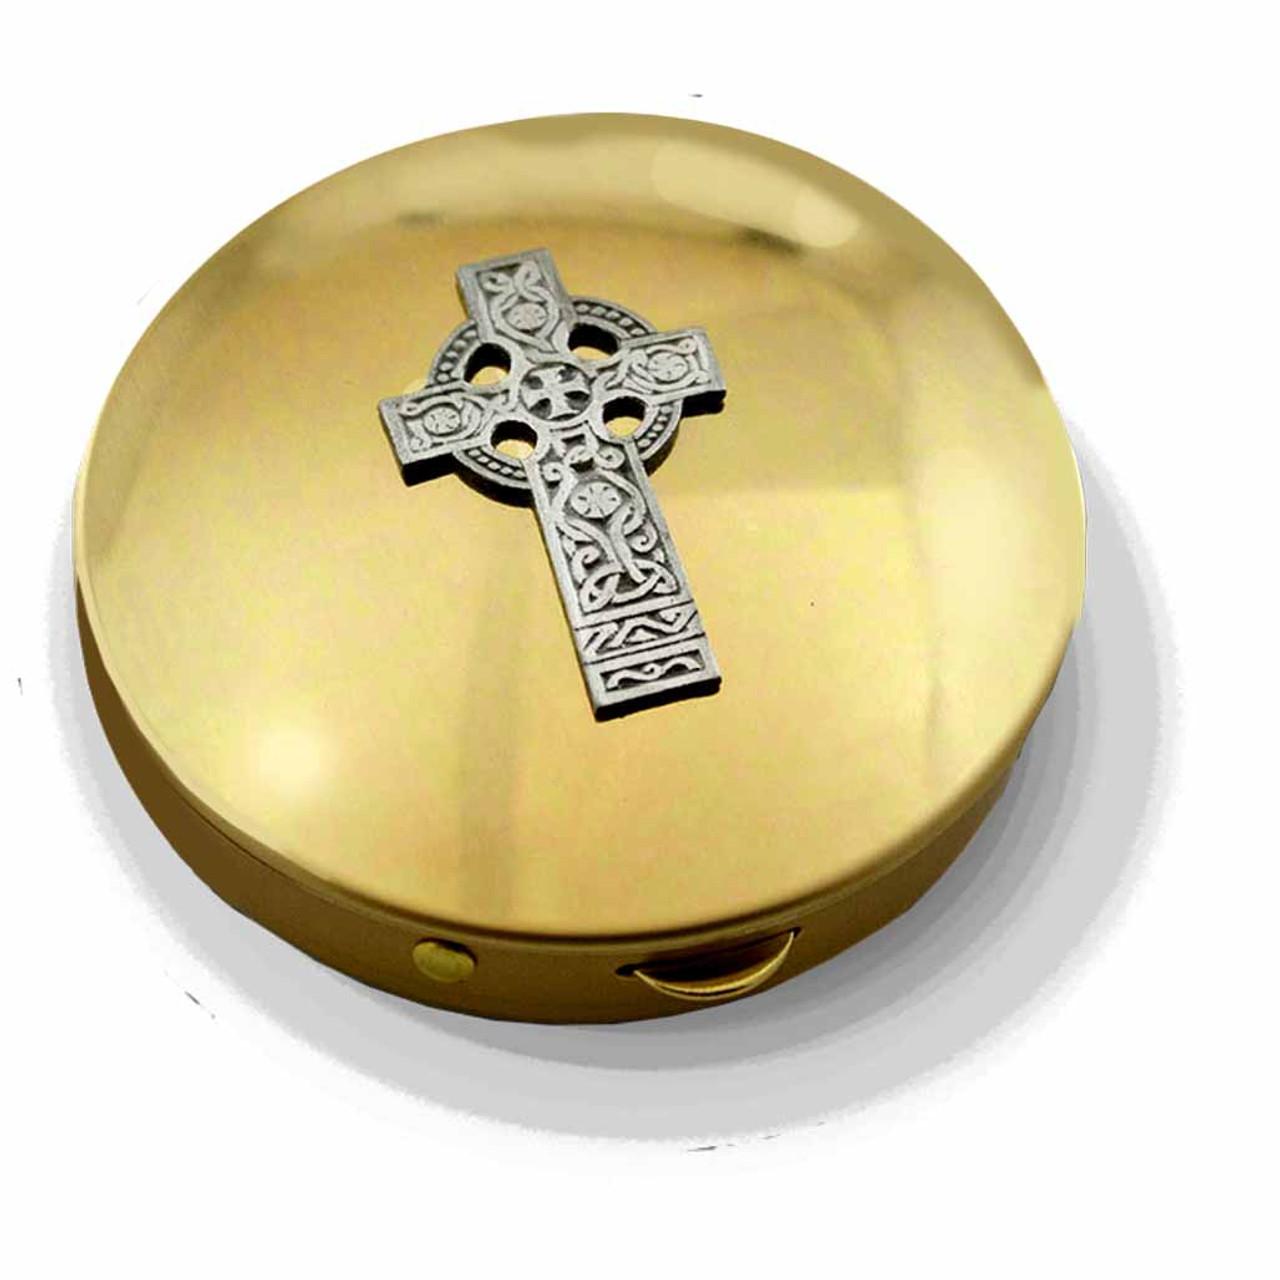 PS 143 Brass Pyx with Celtic Cross